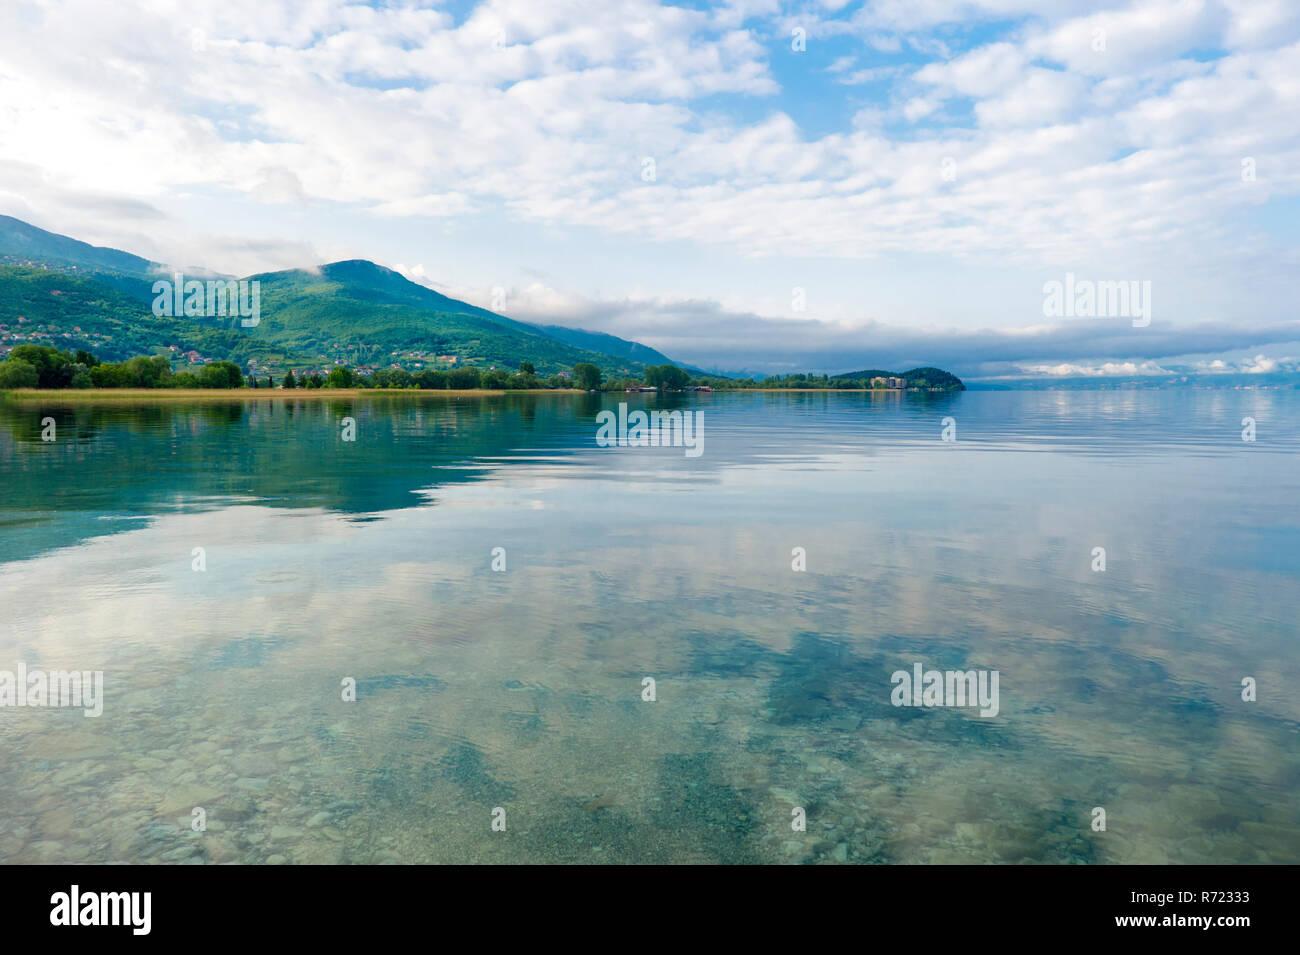 Lake Ohrid, Macedonia - Stock Image